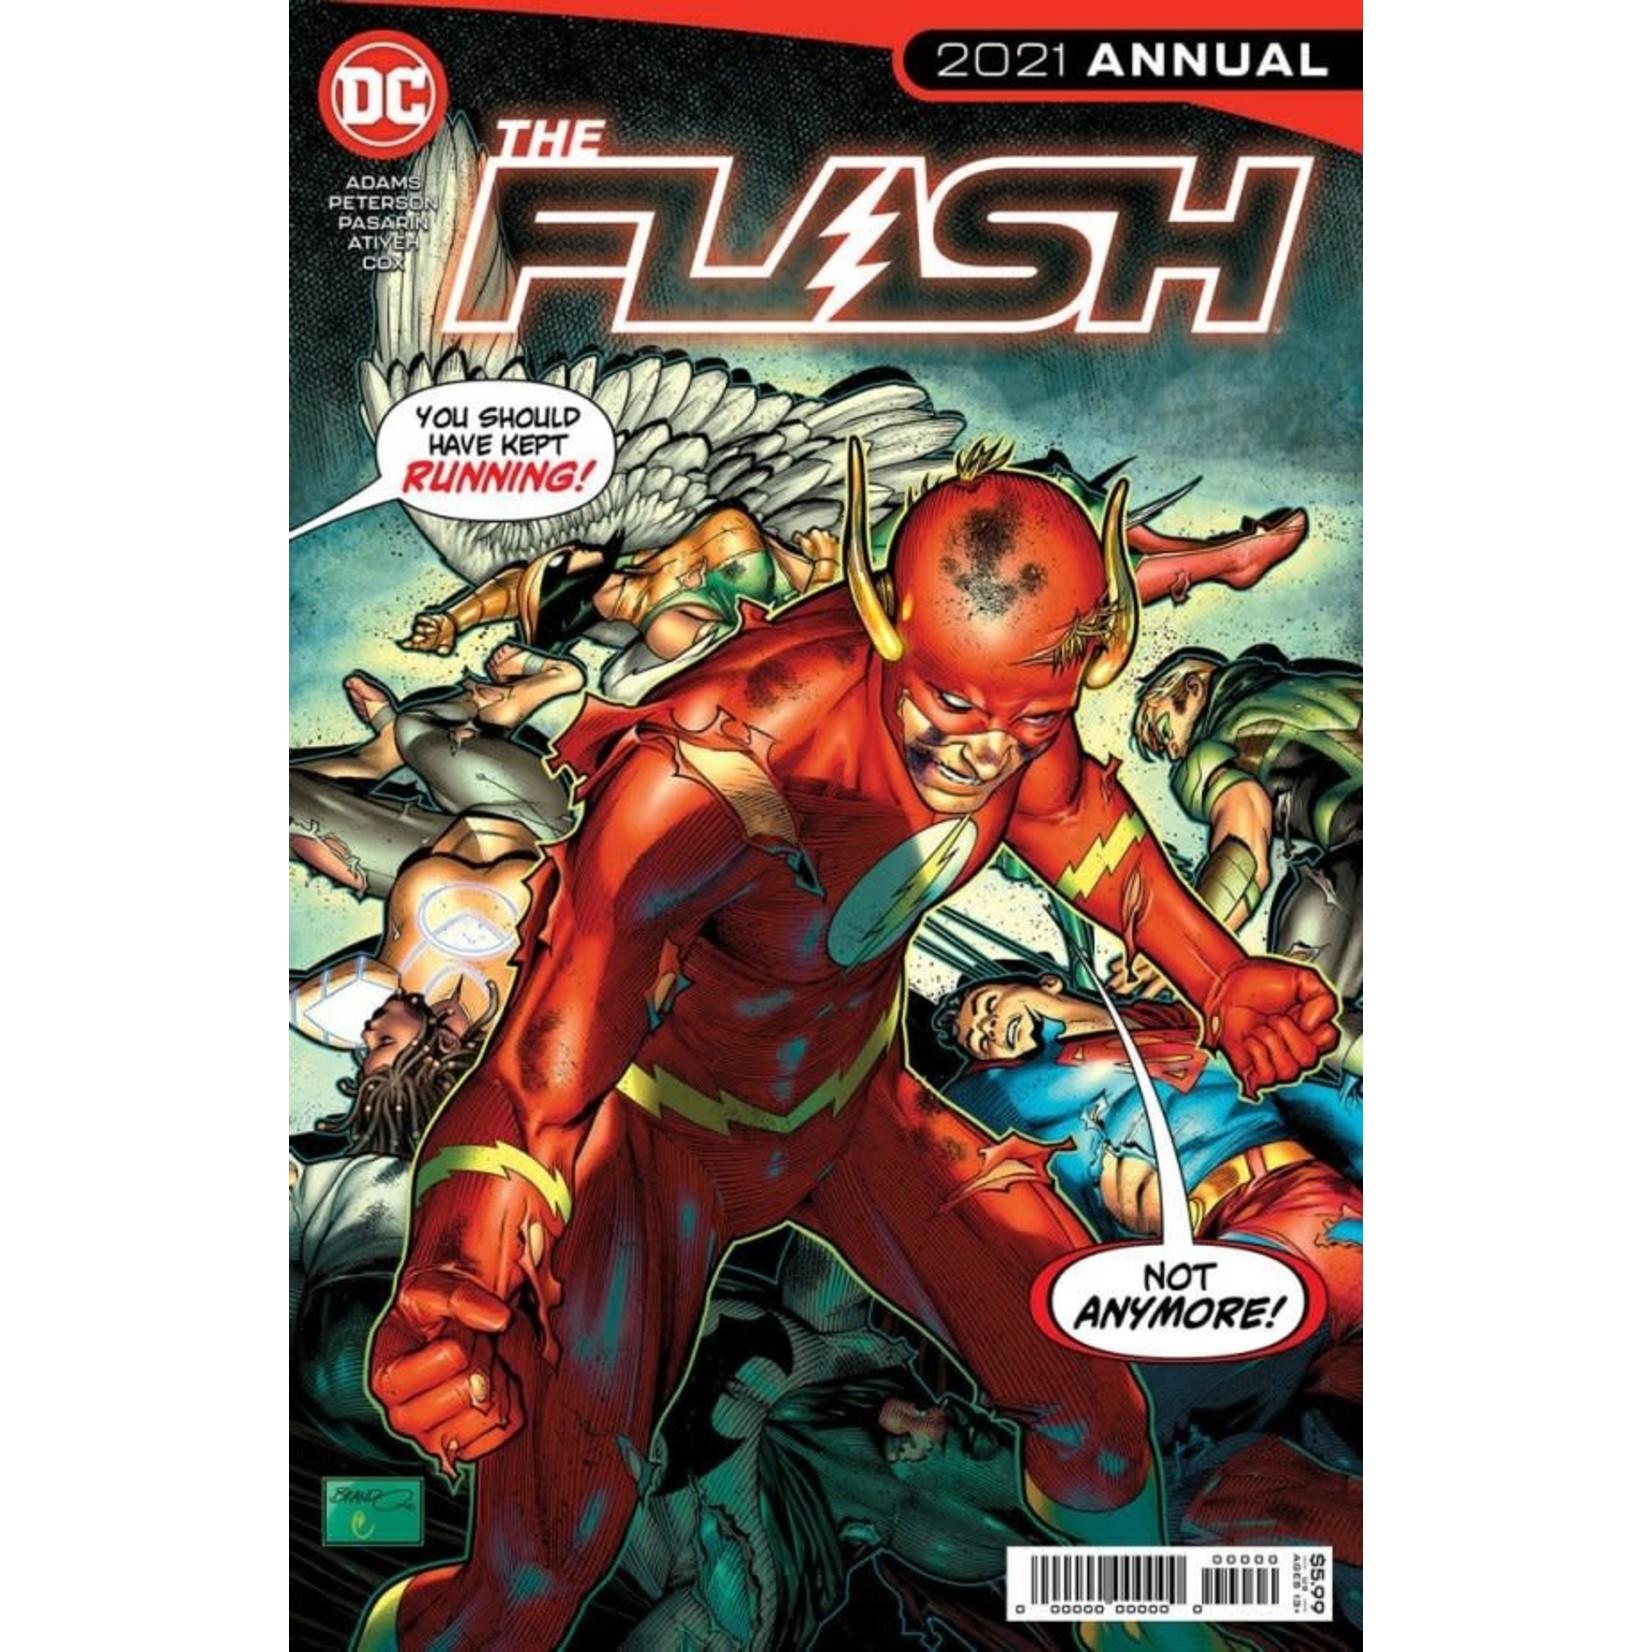 DC Comics The Flash Annual 2021 #1